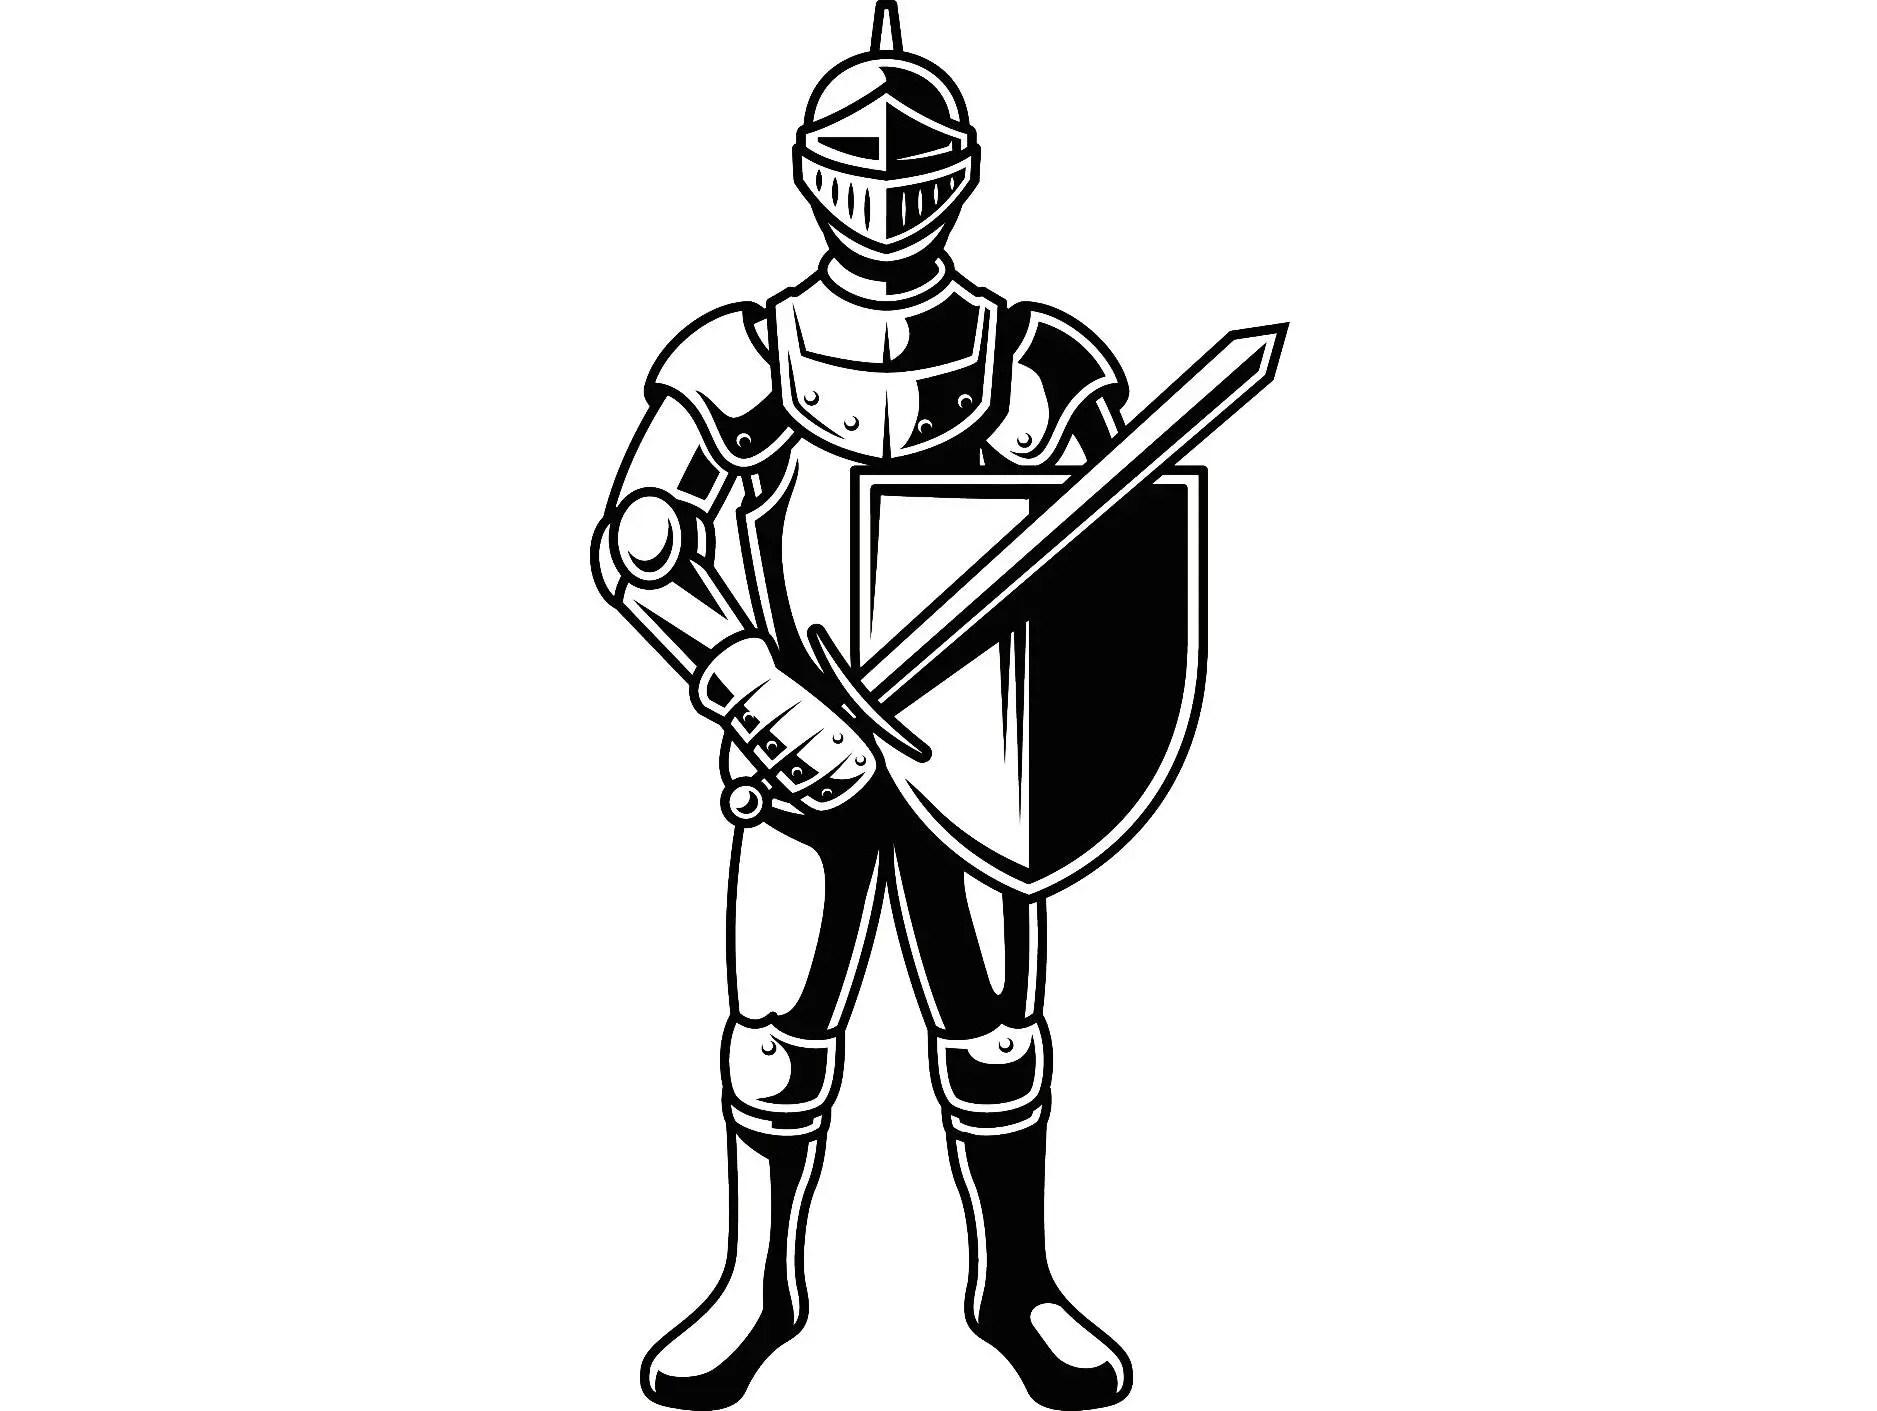 Knight #2 Metal Armor Helmet Sword Shield Monarch Military